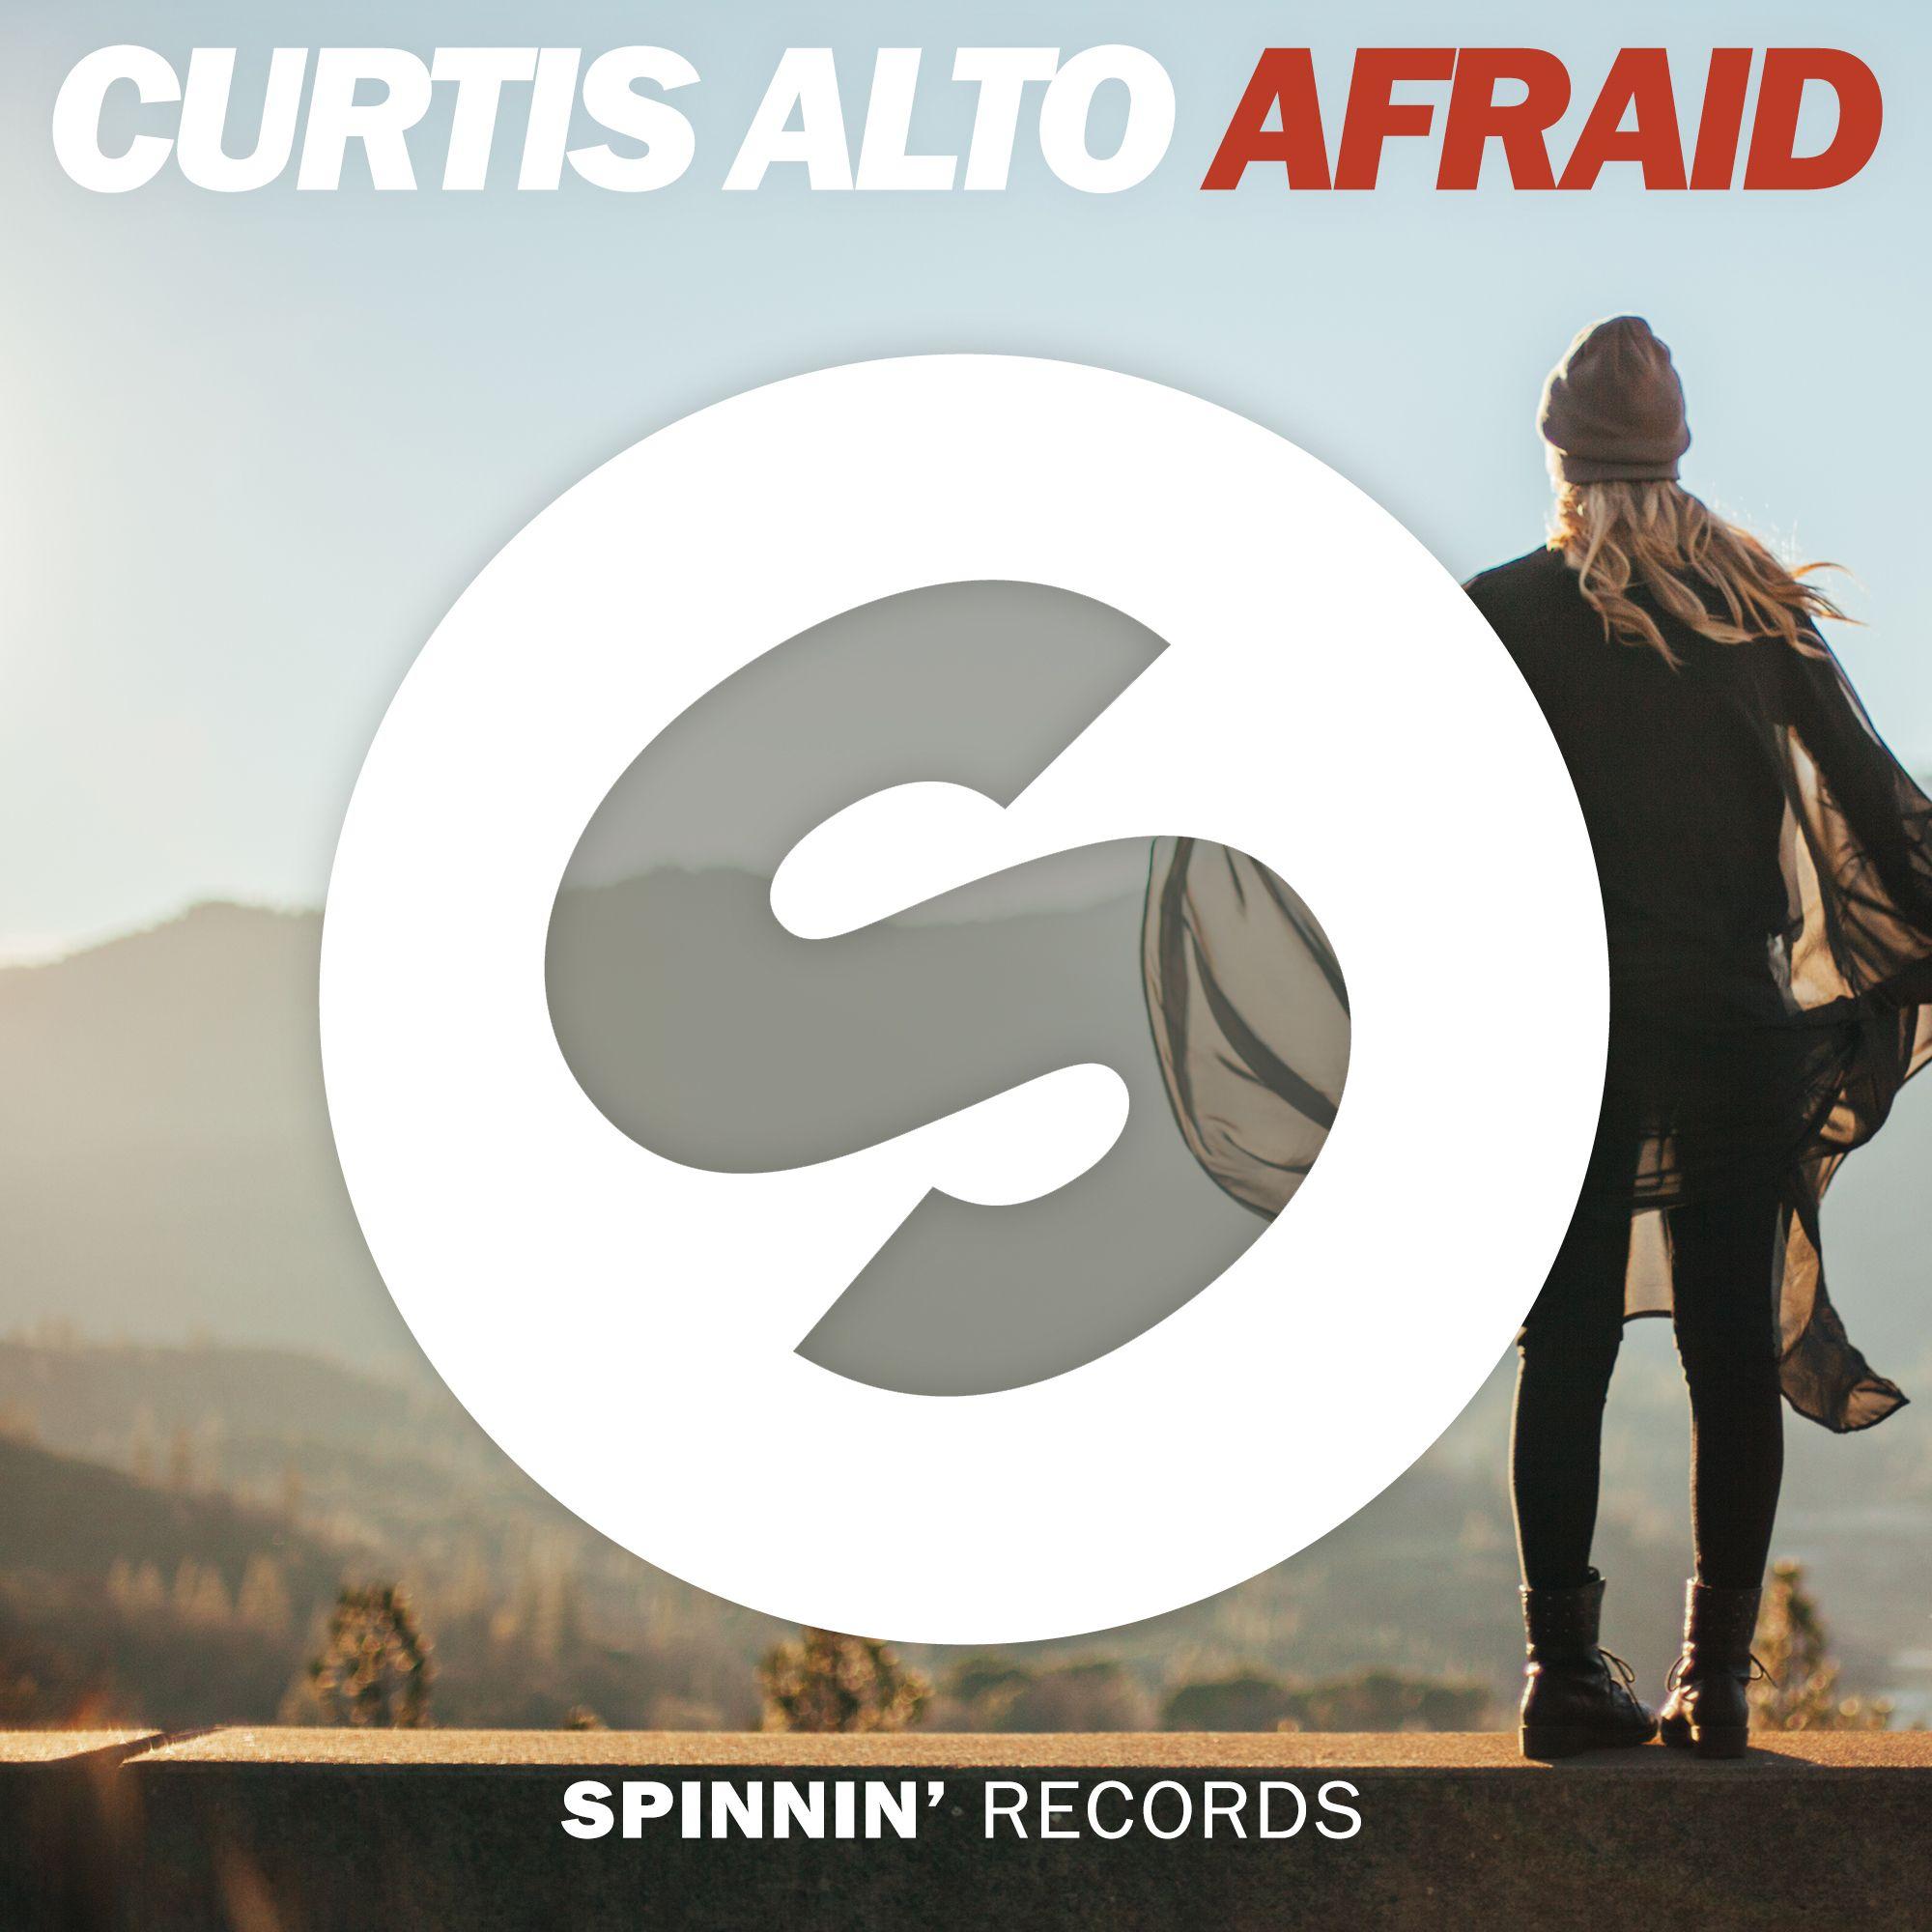 spinnin_curtis_alto_-_afraid.jpg